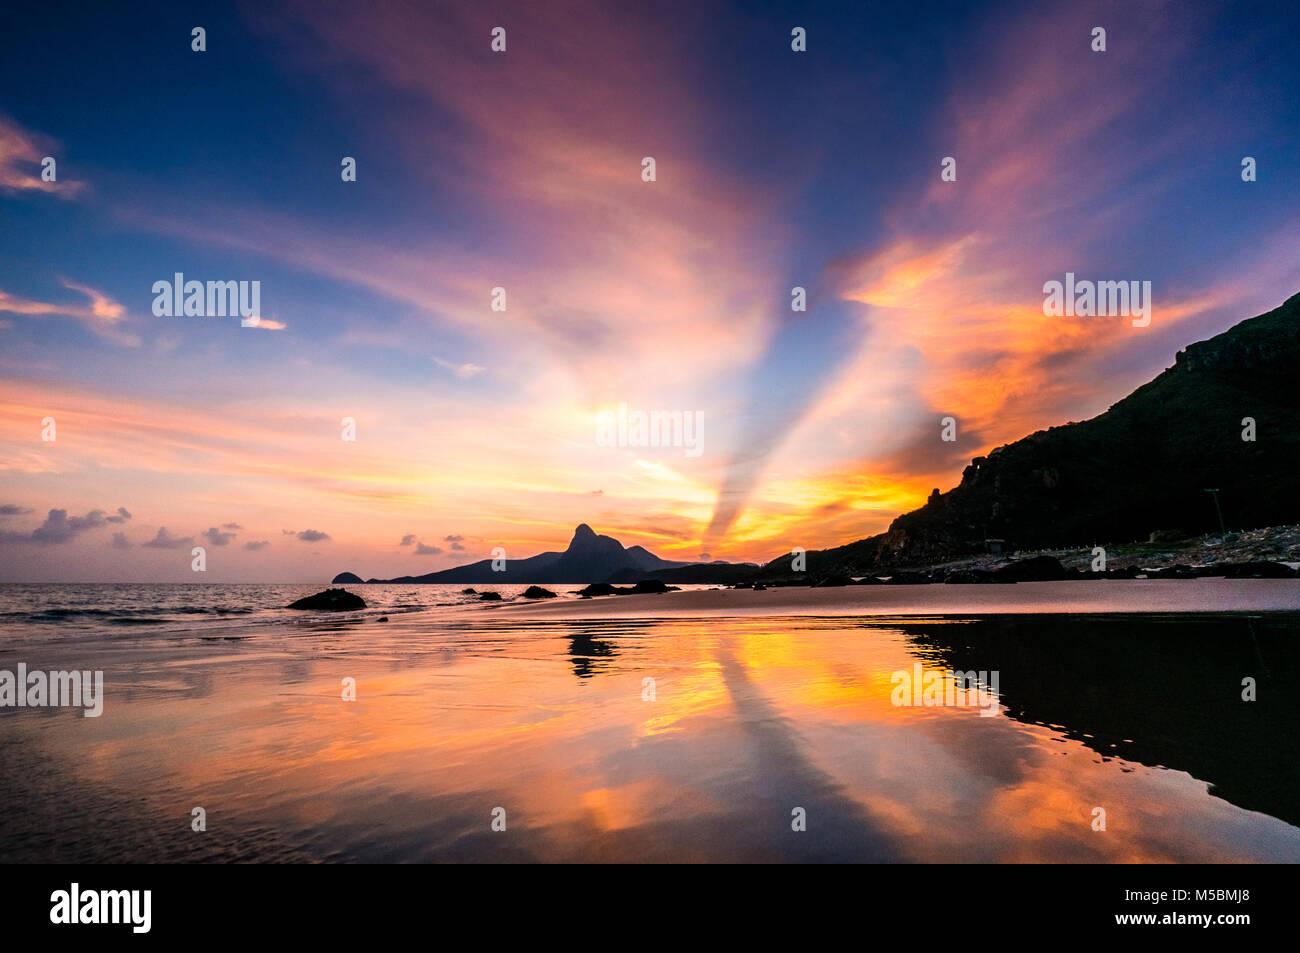 Sunset on mountain Love. View from Nhát beach. Con Dao island, Ba Ria, Vung Tau, Vietnam Stock Photo